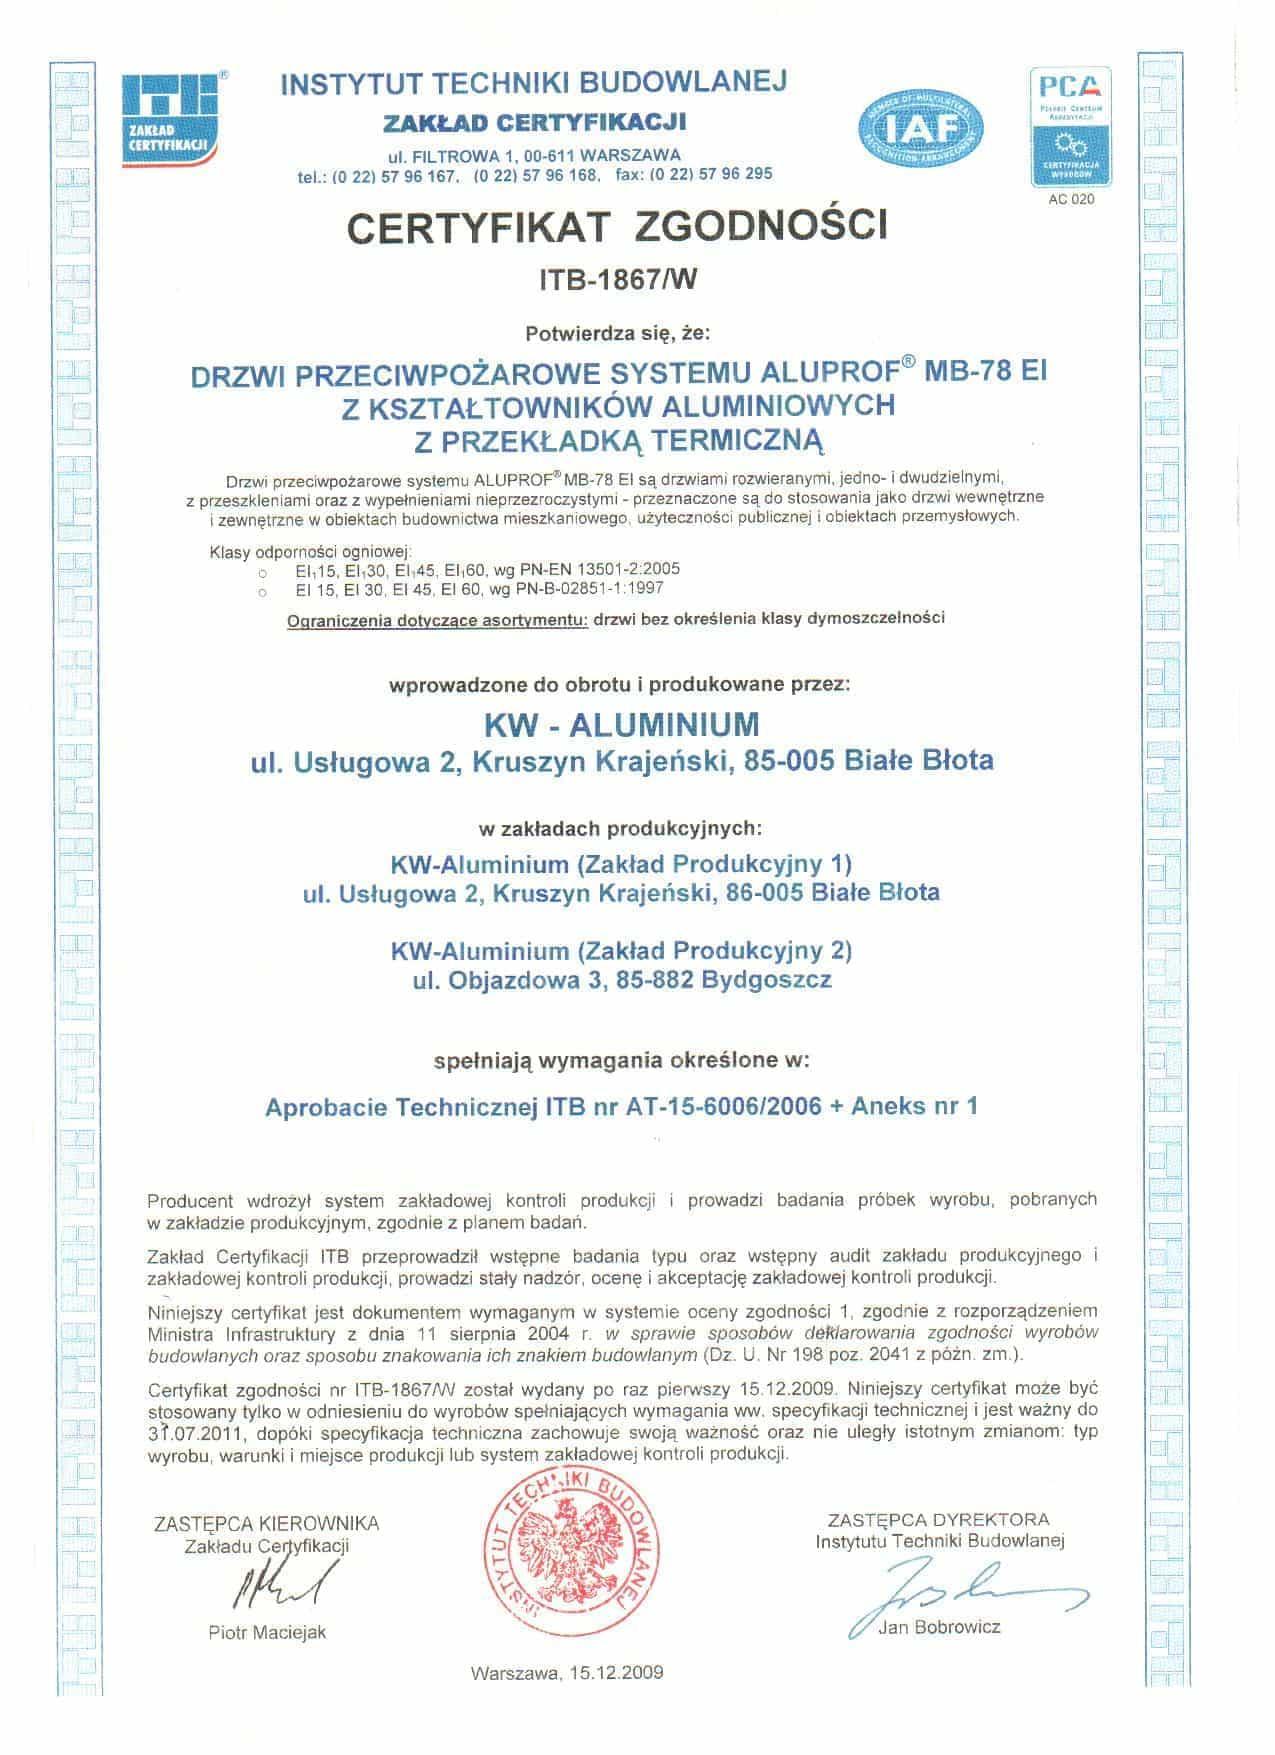 Instytut Techniki Budowlanej – Certyfikat Zgodności